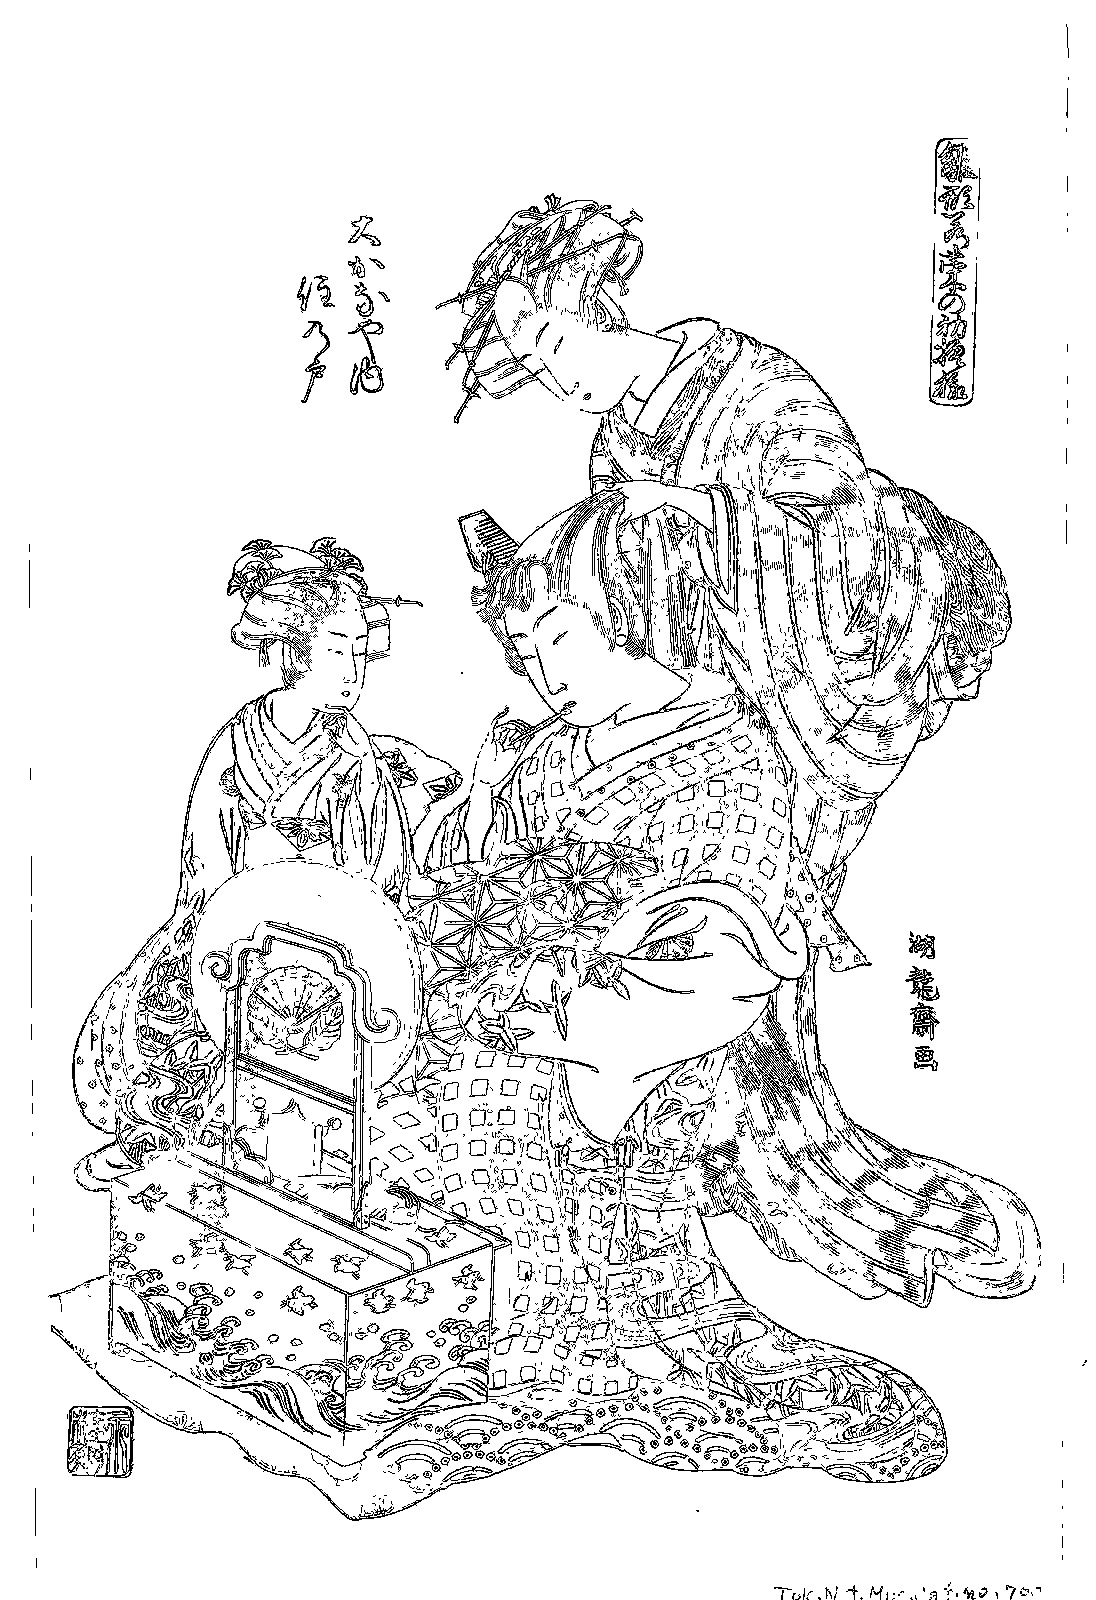 磯田湖龍齋 The courtesan Suminoto of the Ōkana-ya